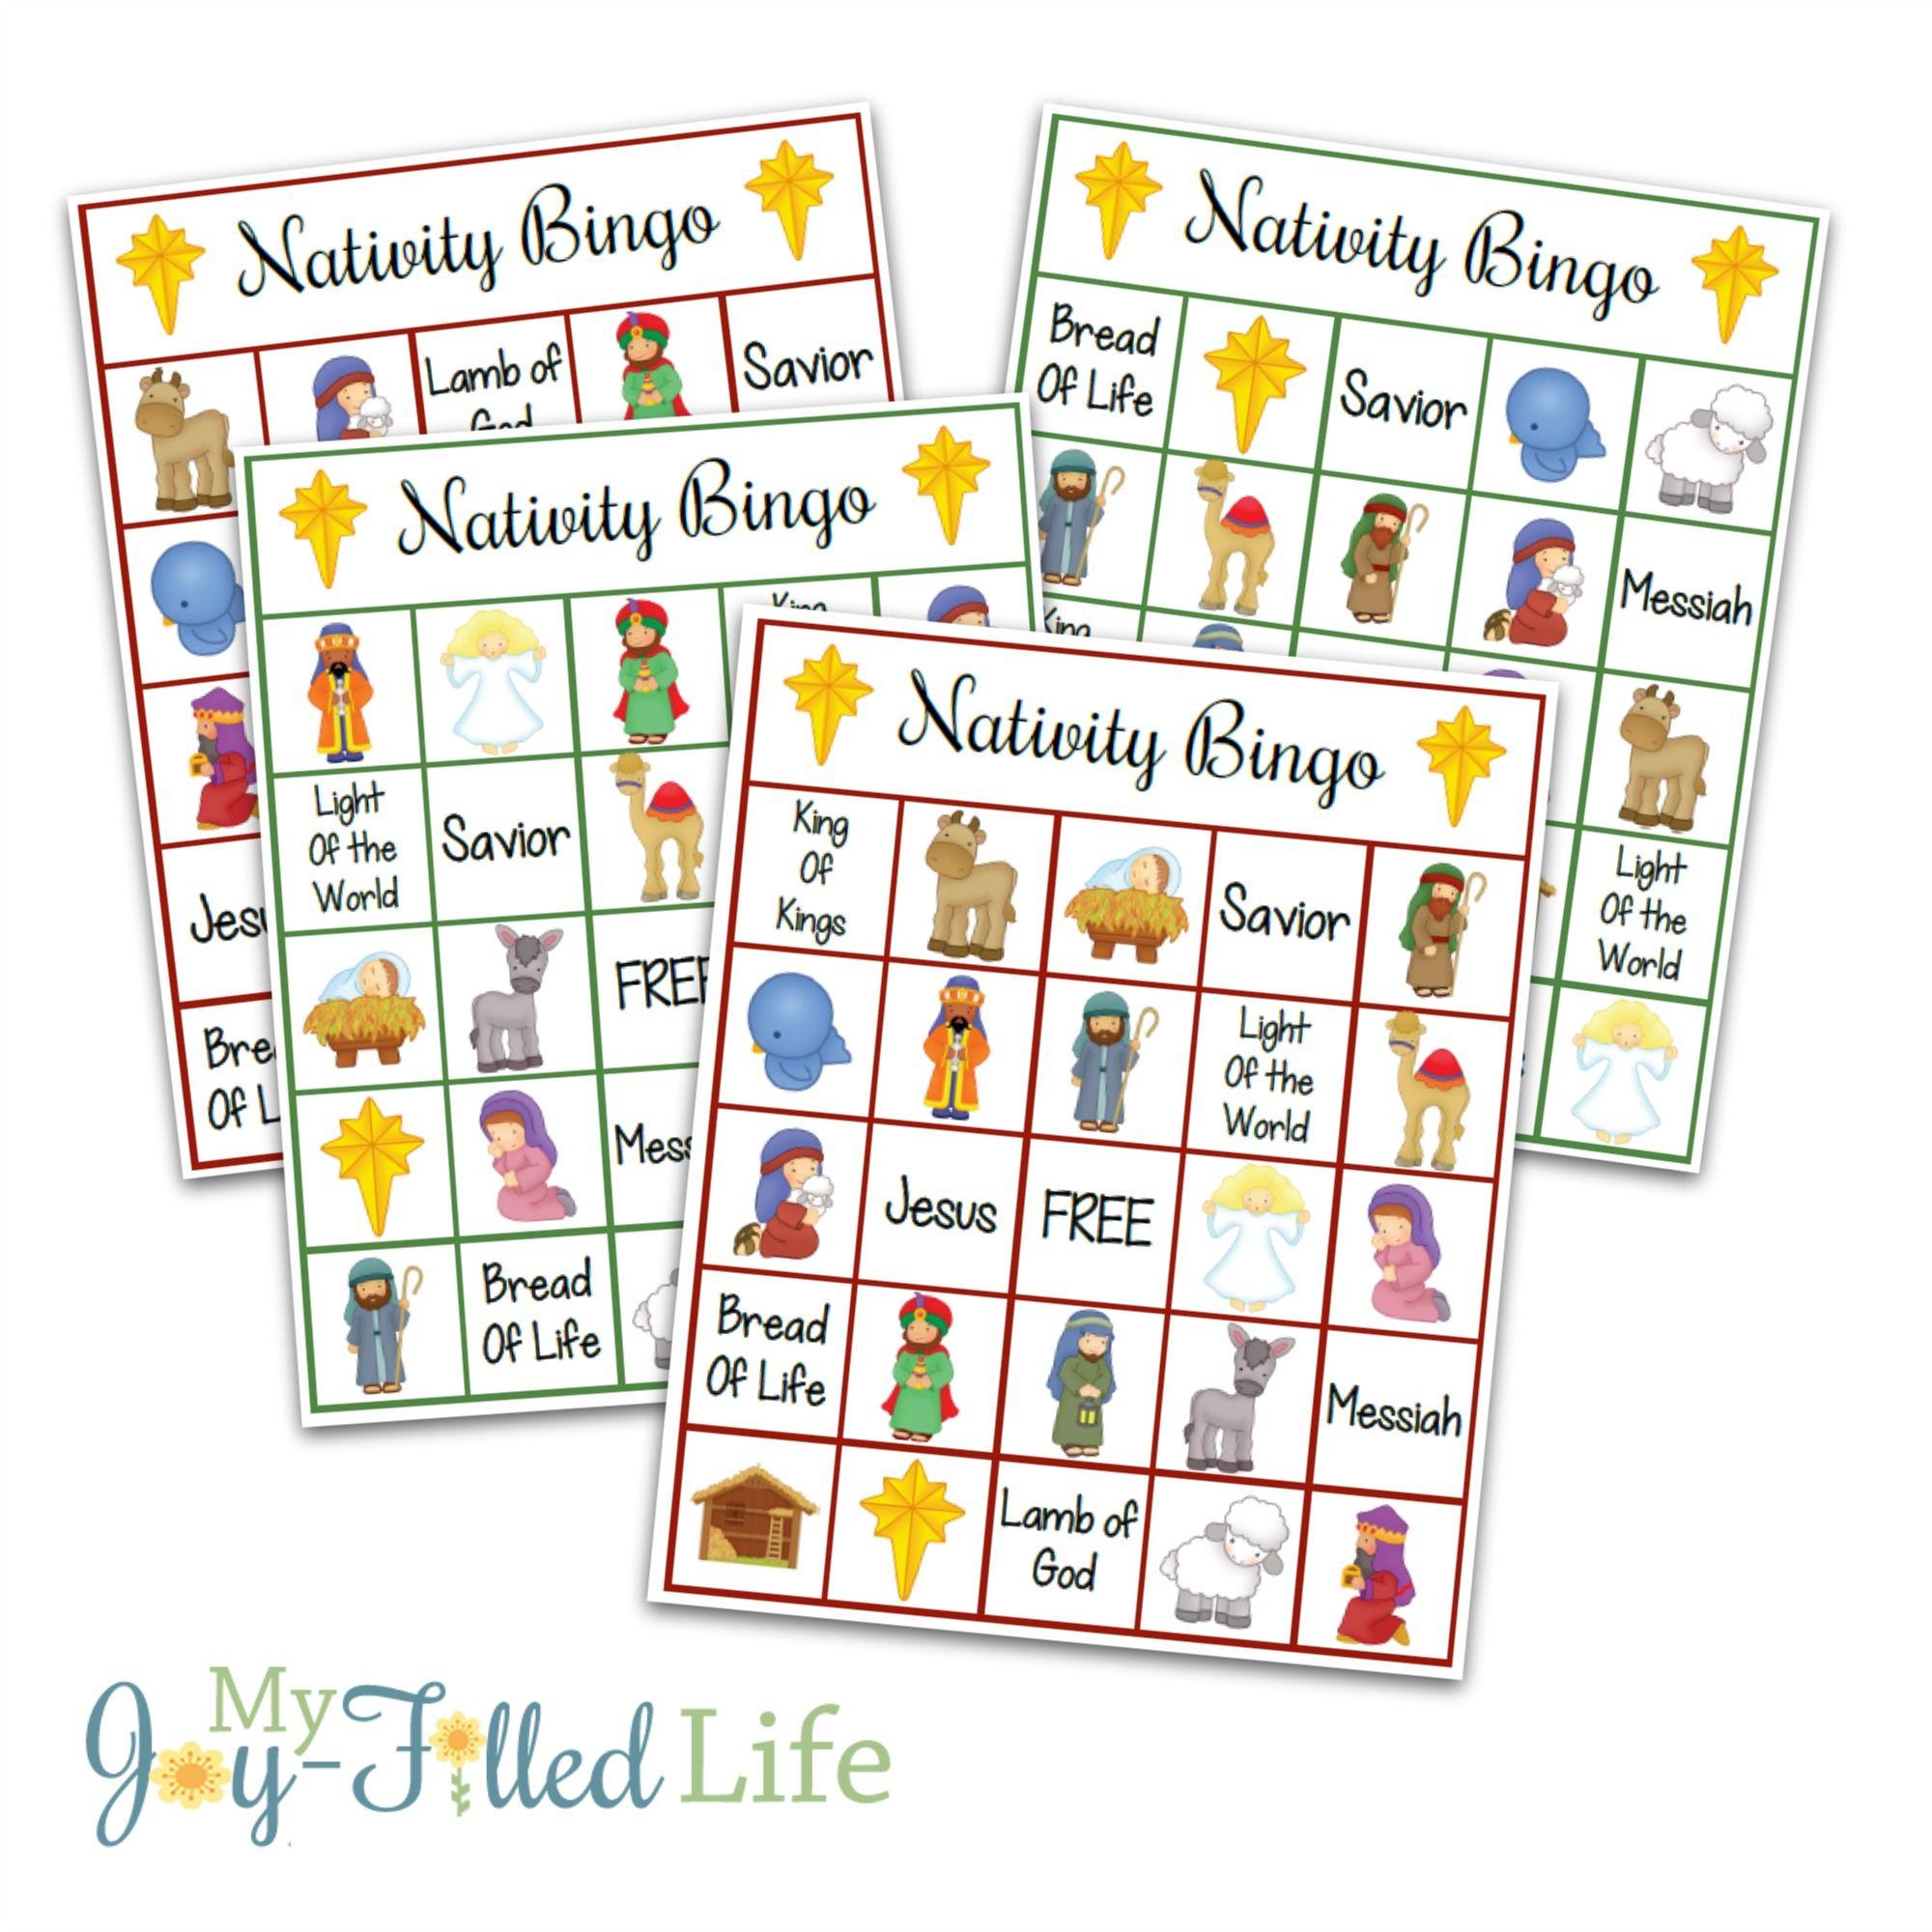 Christmas Bingo Game, Nativity Bingo Printable Holiday Bingo - Free Printable Religious Christmas Games